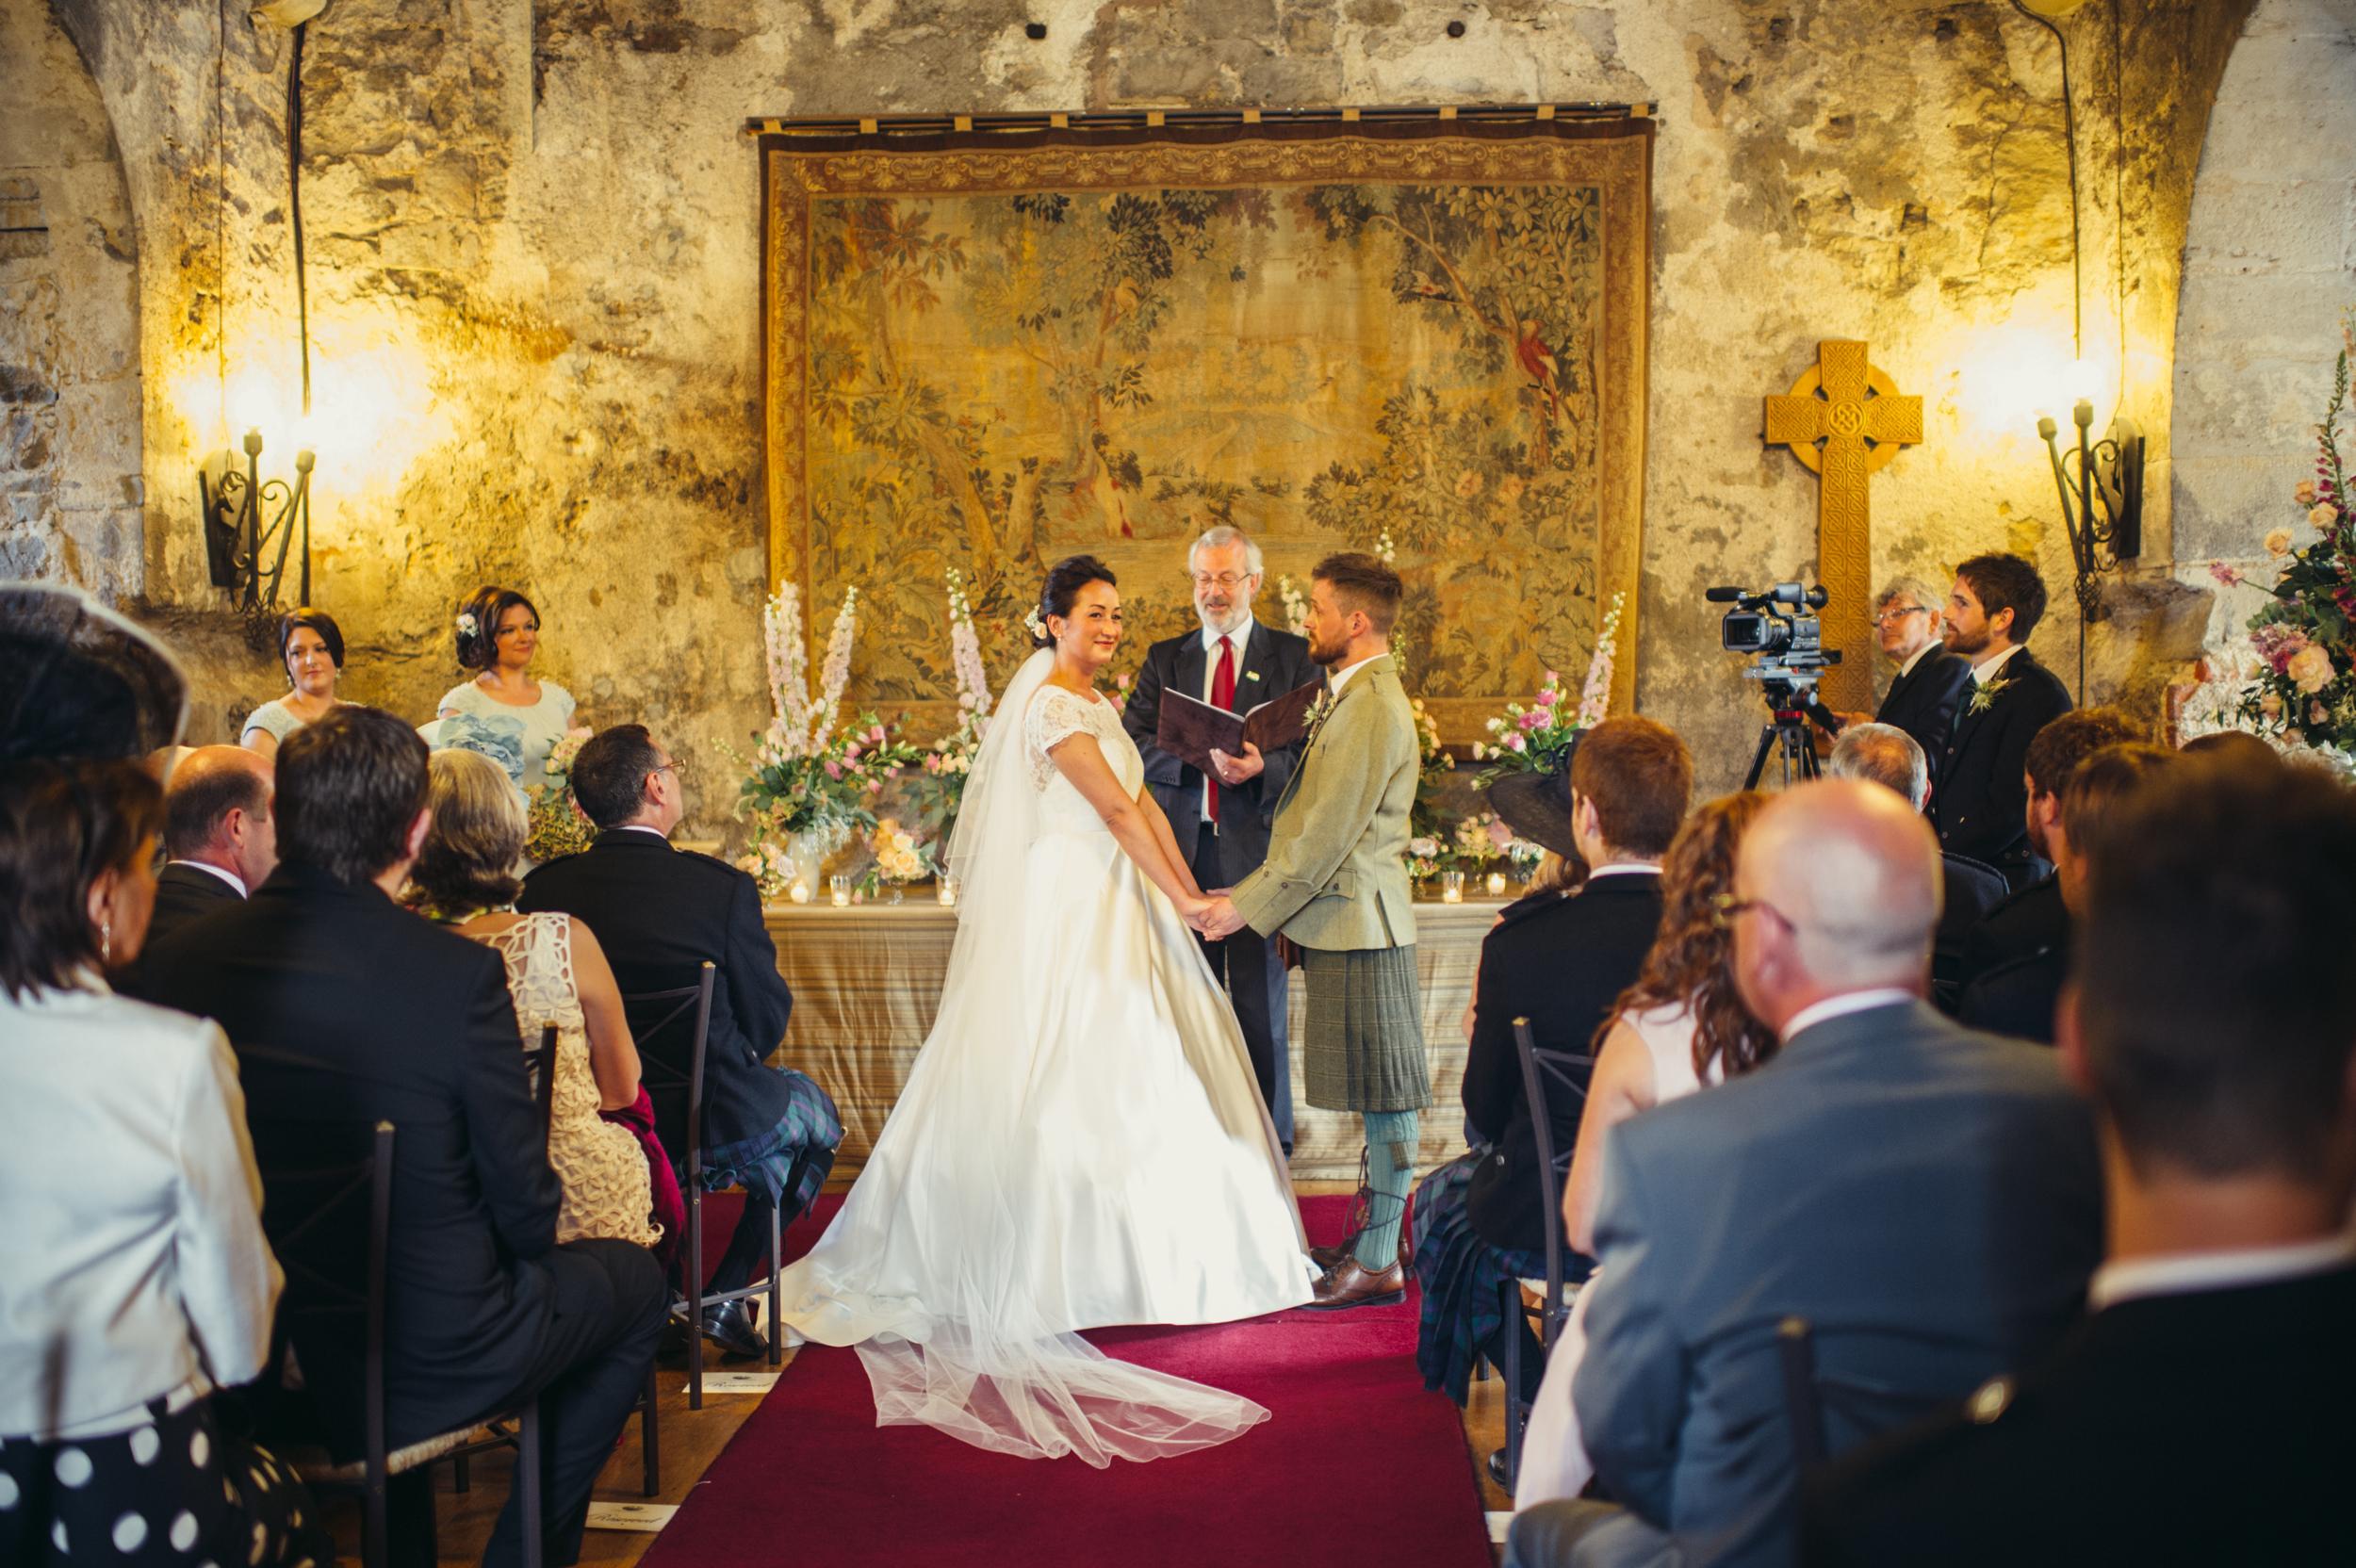 0103-lisa-devine-alternative-creative-wedding-photography-glasgow-edinburgh.JPG